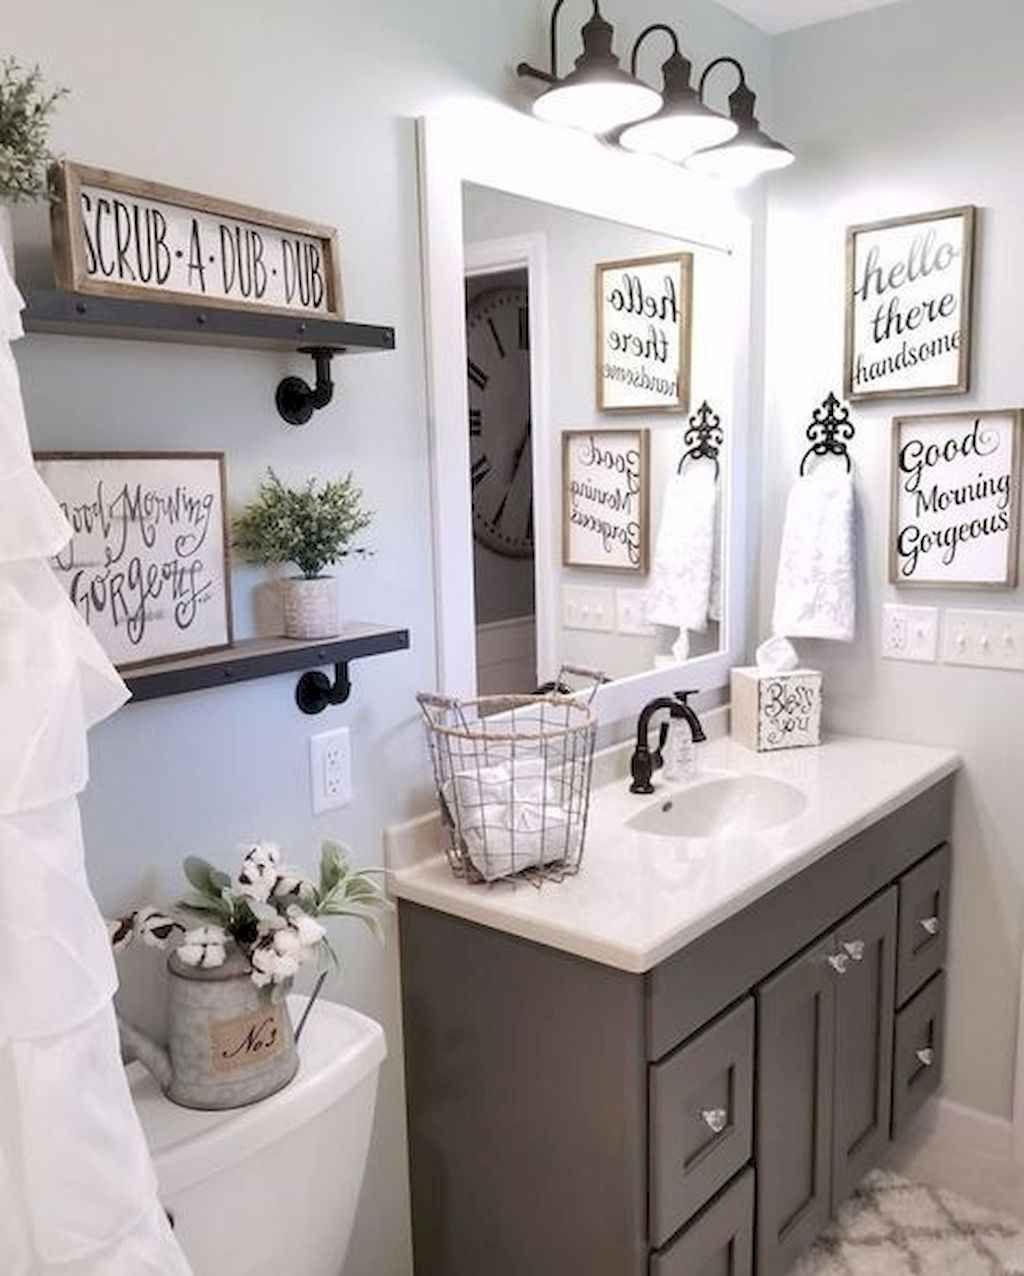 Awesome 50 Modern Farmhouse Bathroom Decor Ideas Source Link Https Decortutor Com 7634 50 Mo Guest Bathroom Decor Bathroom Mirror Modern Farmhouse Bathroom